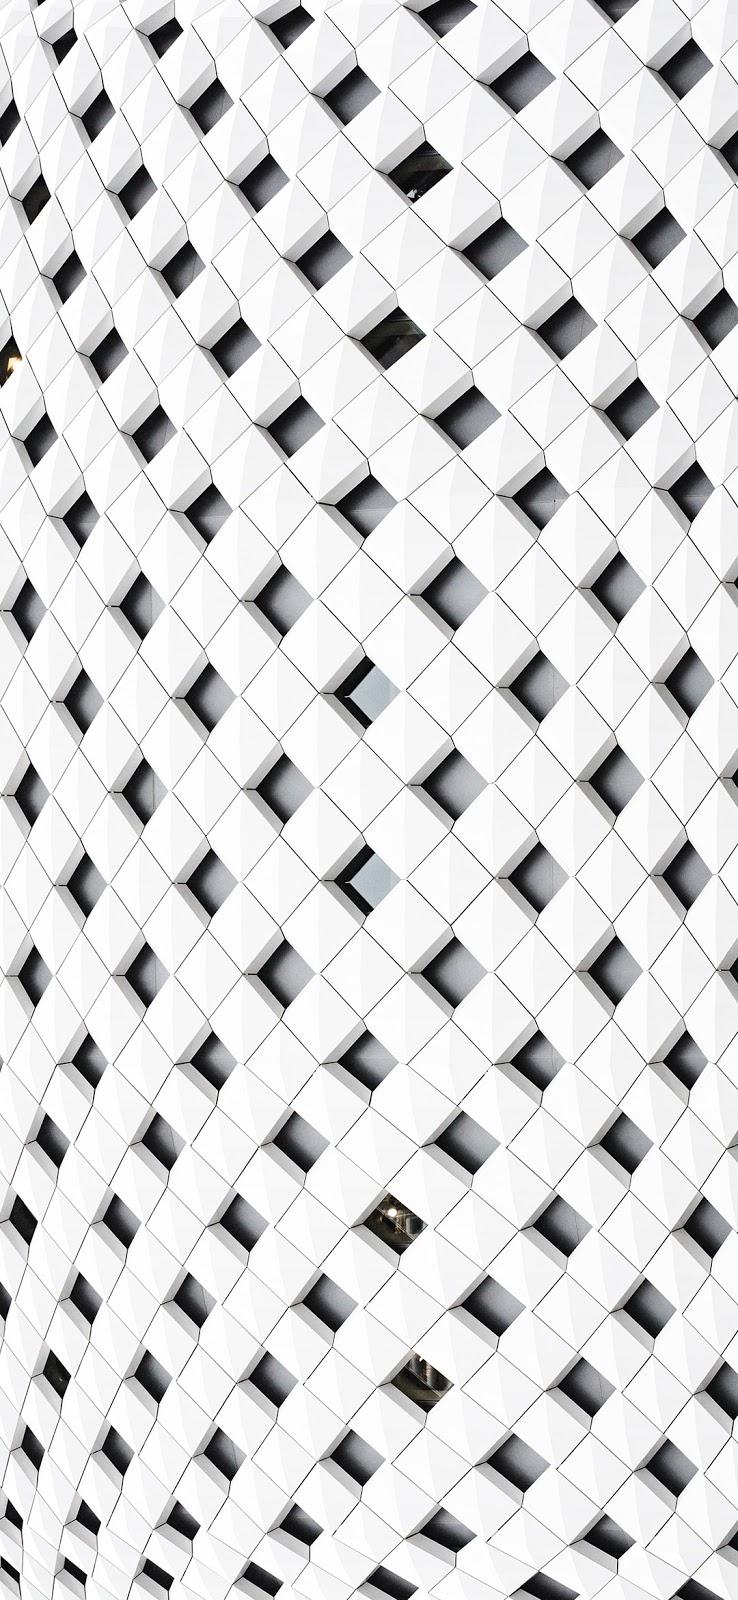 cool white architecture pattern wallpaper